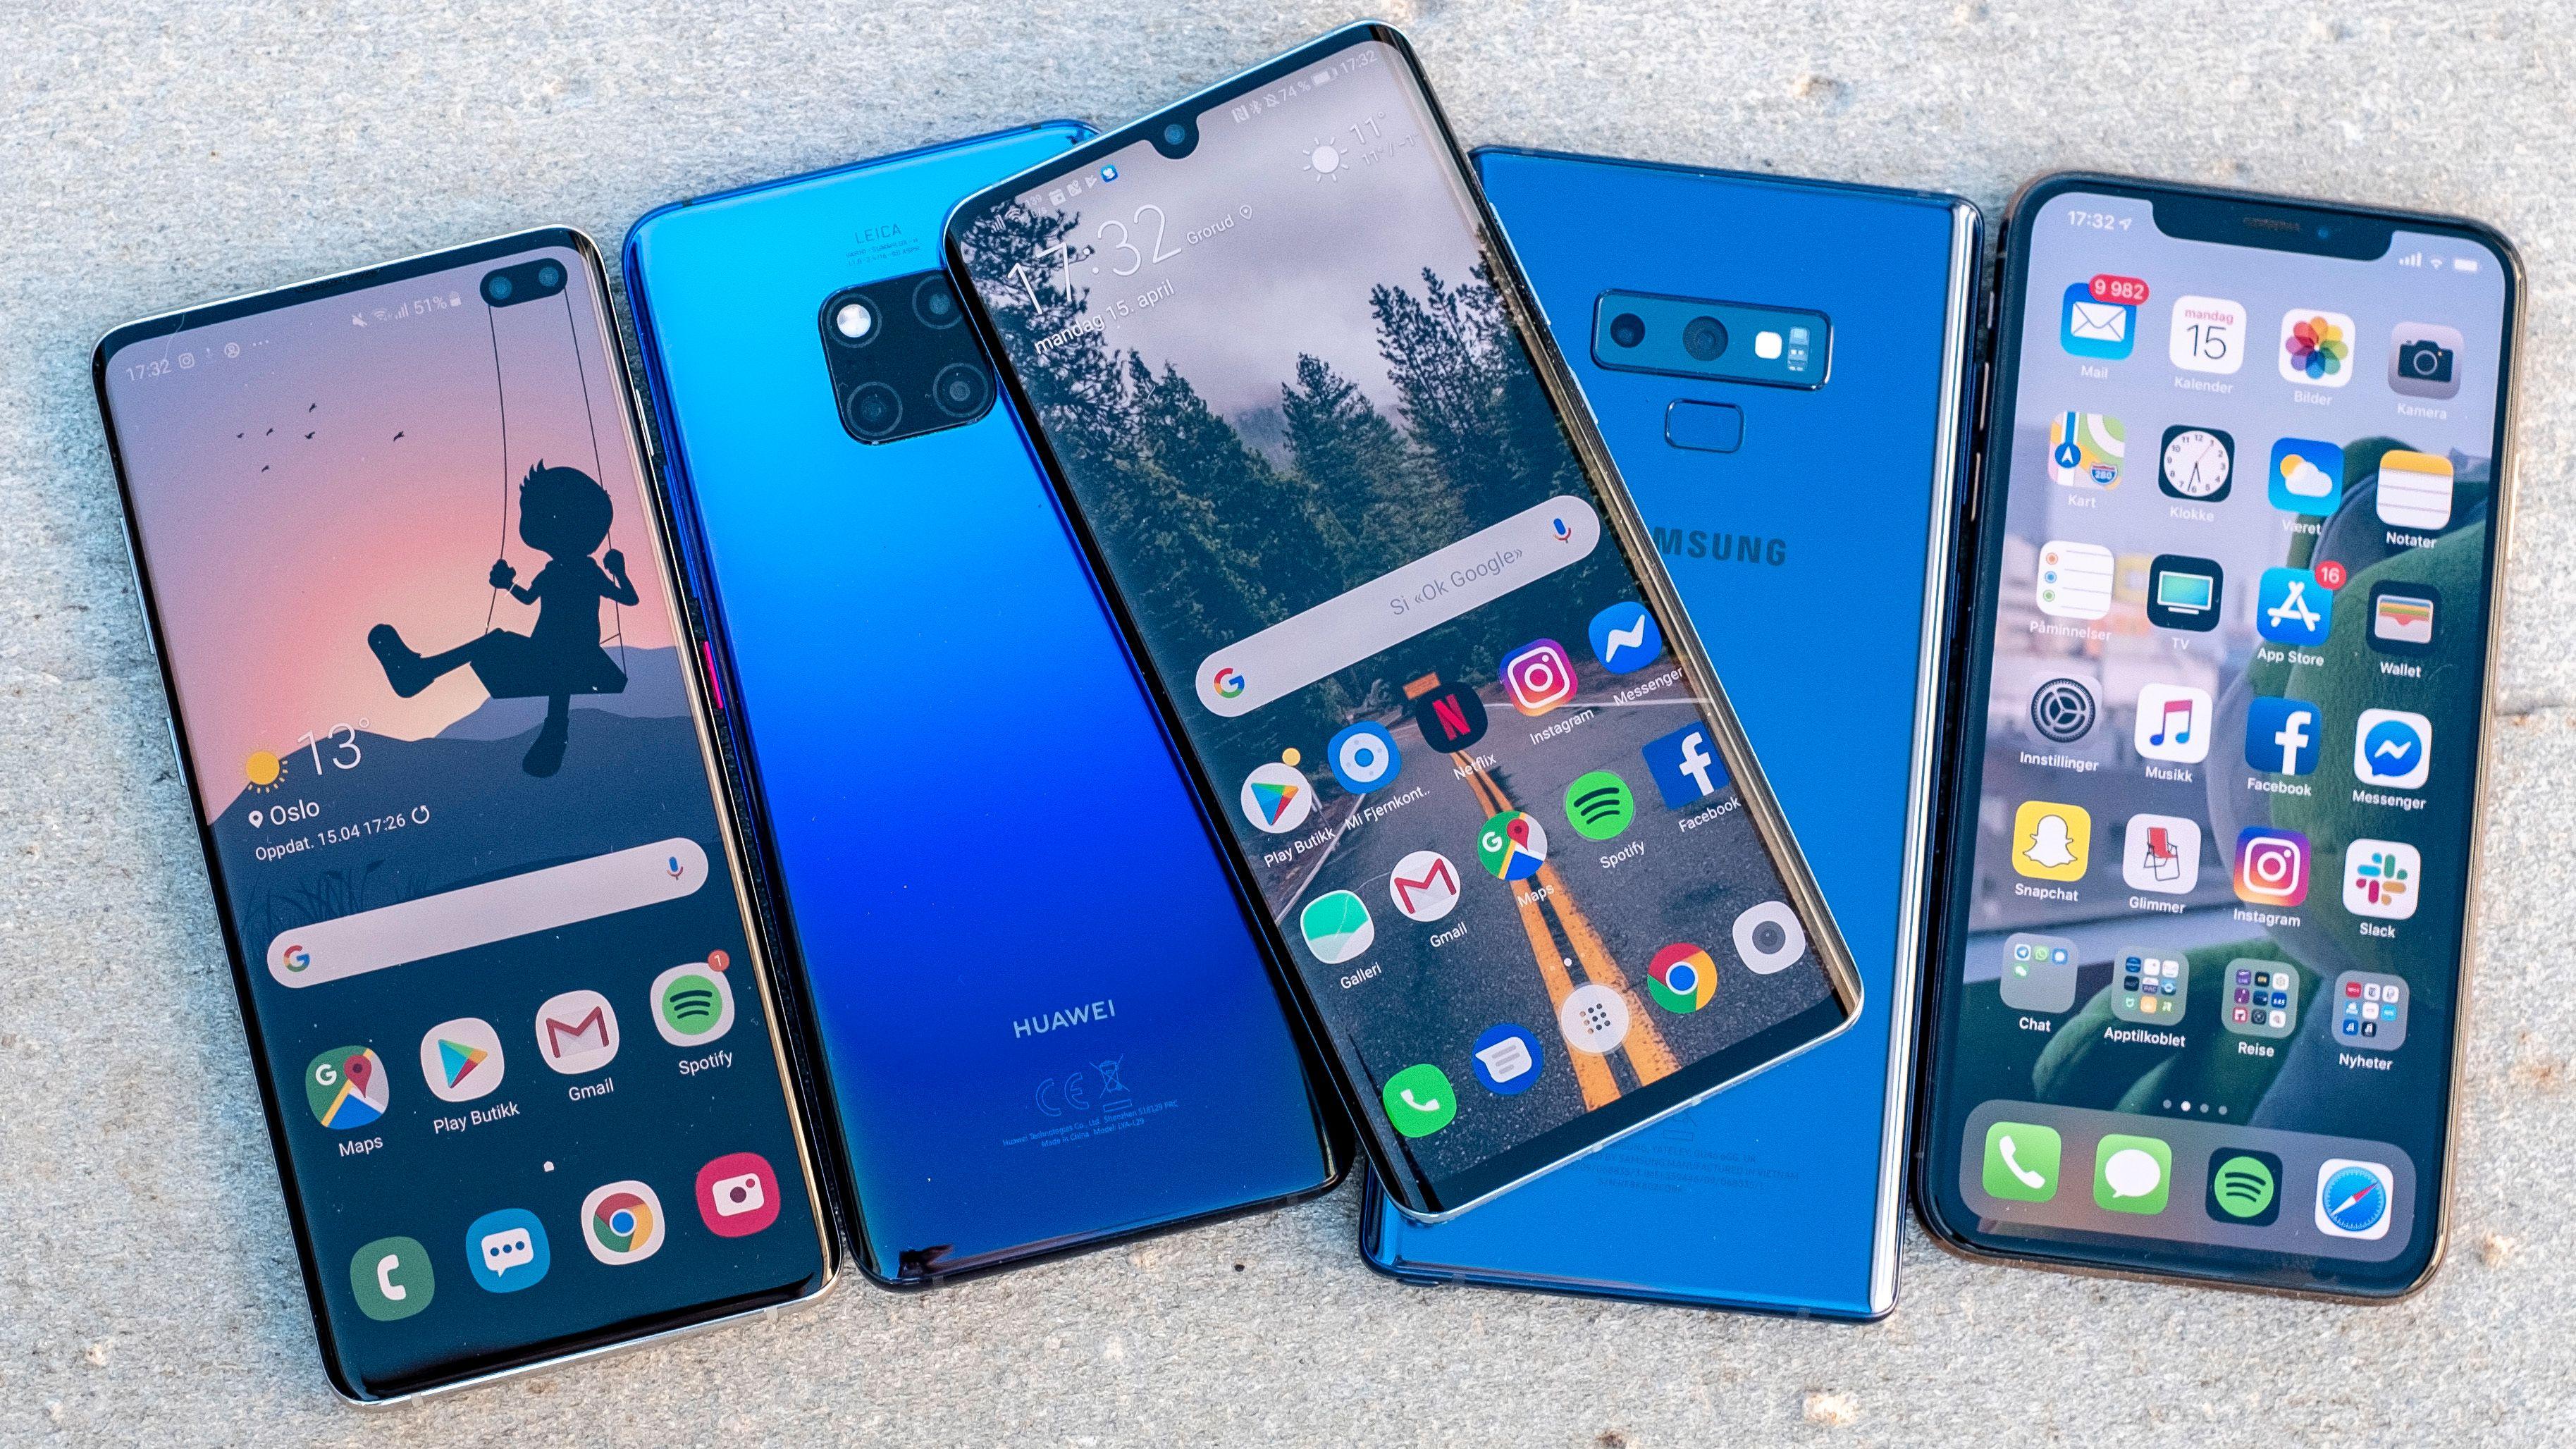 Beste mobil 2019